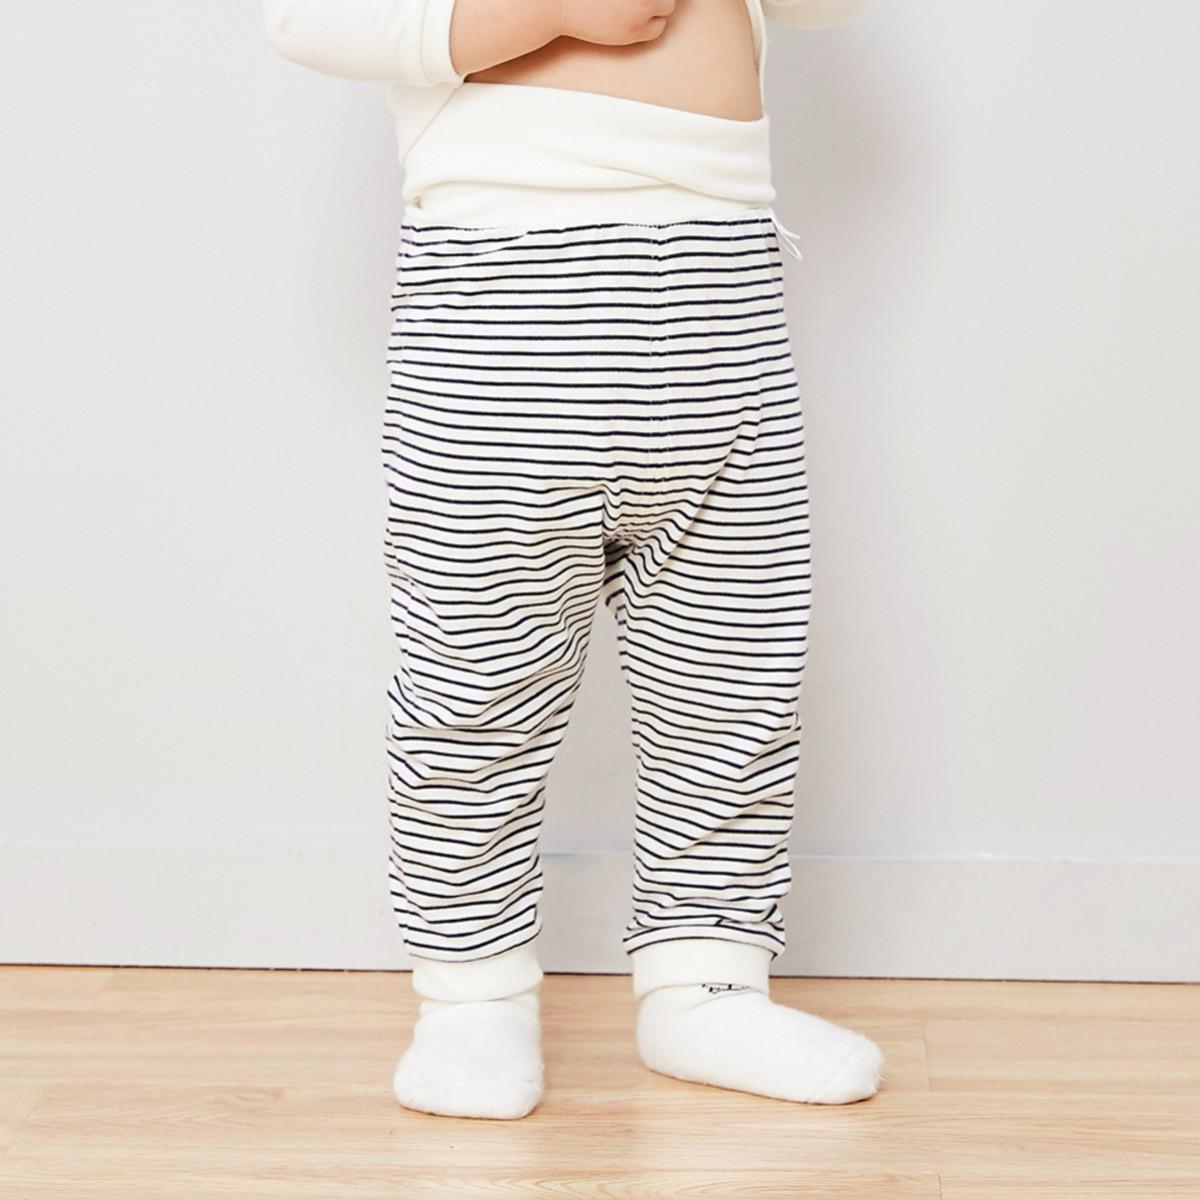 Mini Balabala迷你巴拉巴拉男女婴儿护肚裤2019秋装保暖裤宝宝裤子婴儿裤子M03211921020418